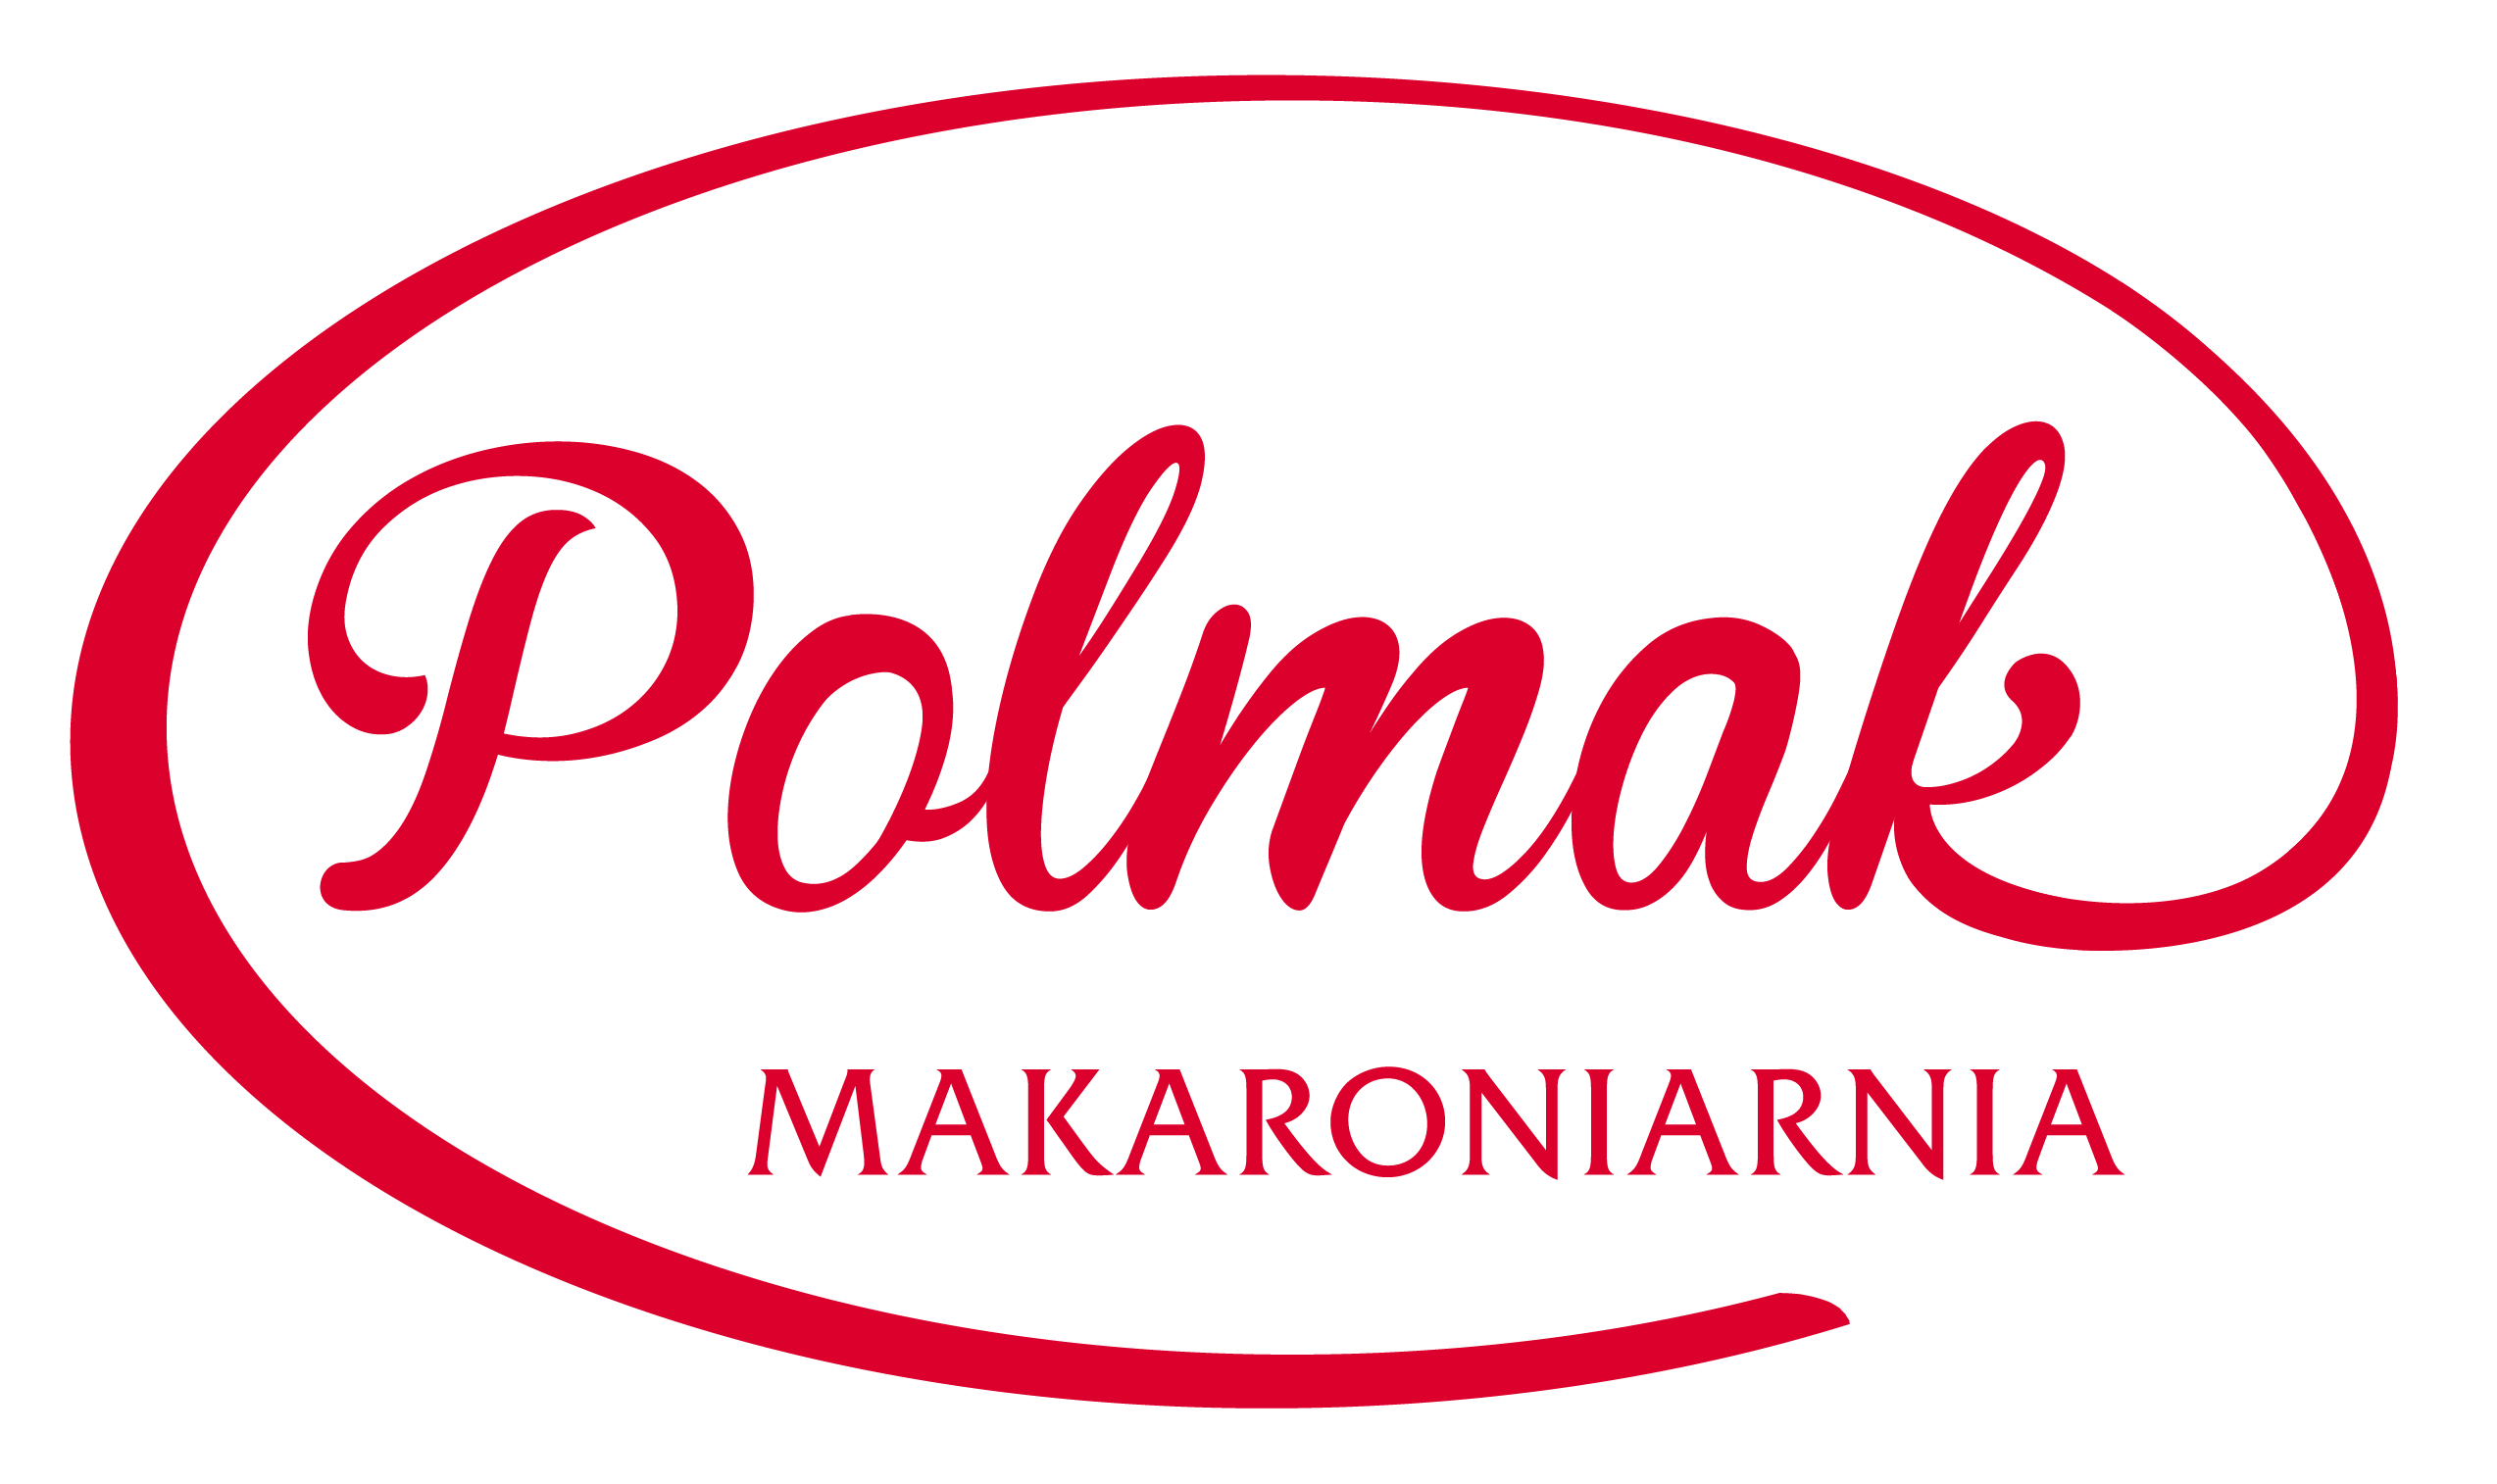 Polmak_MAKARONIARNIA